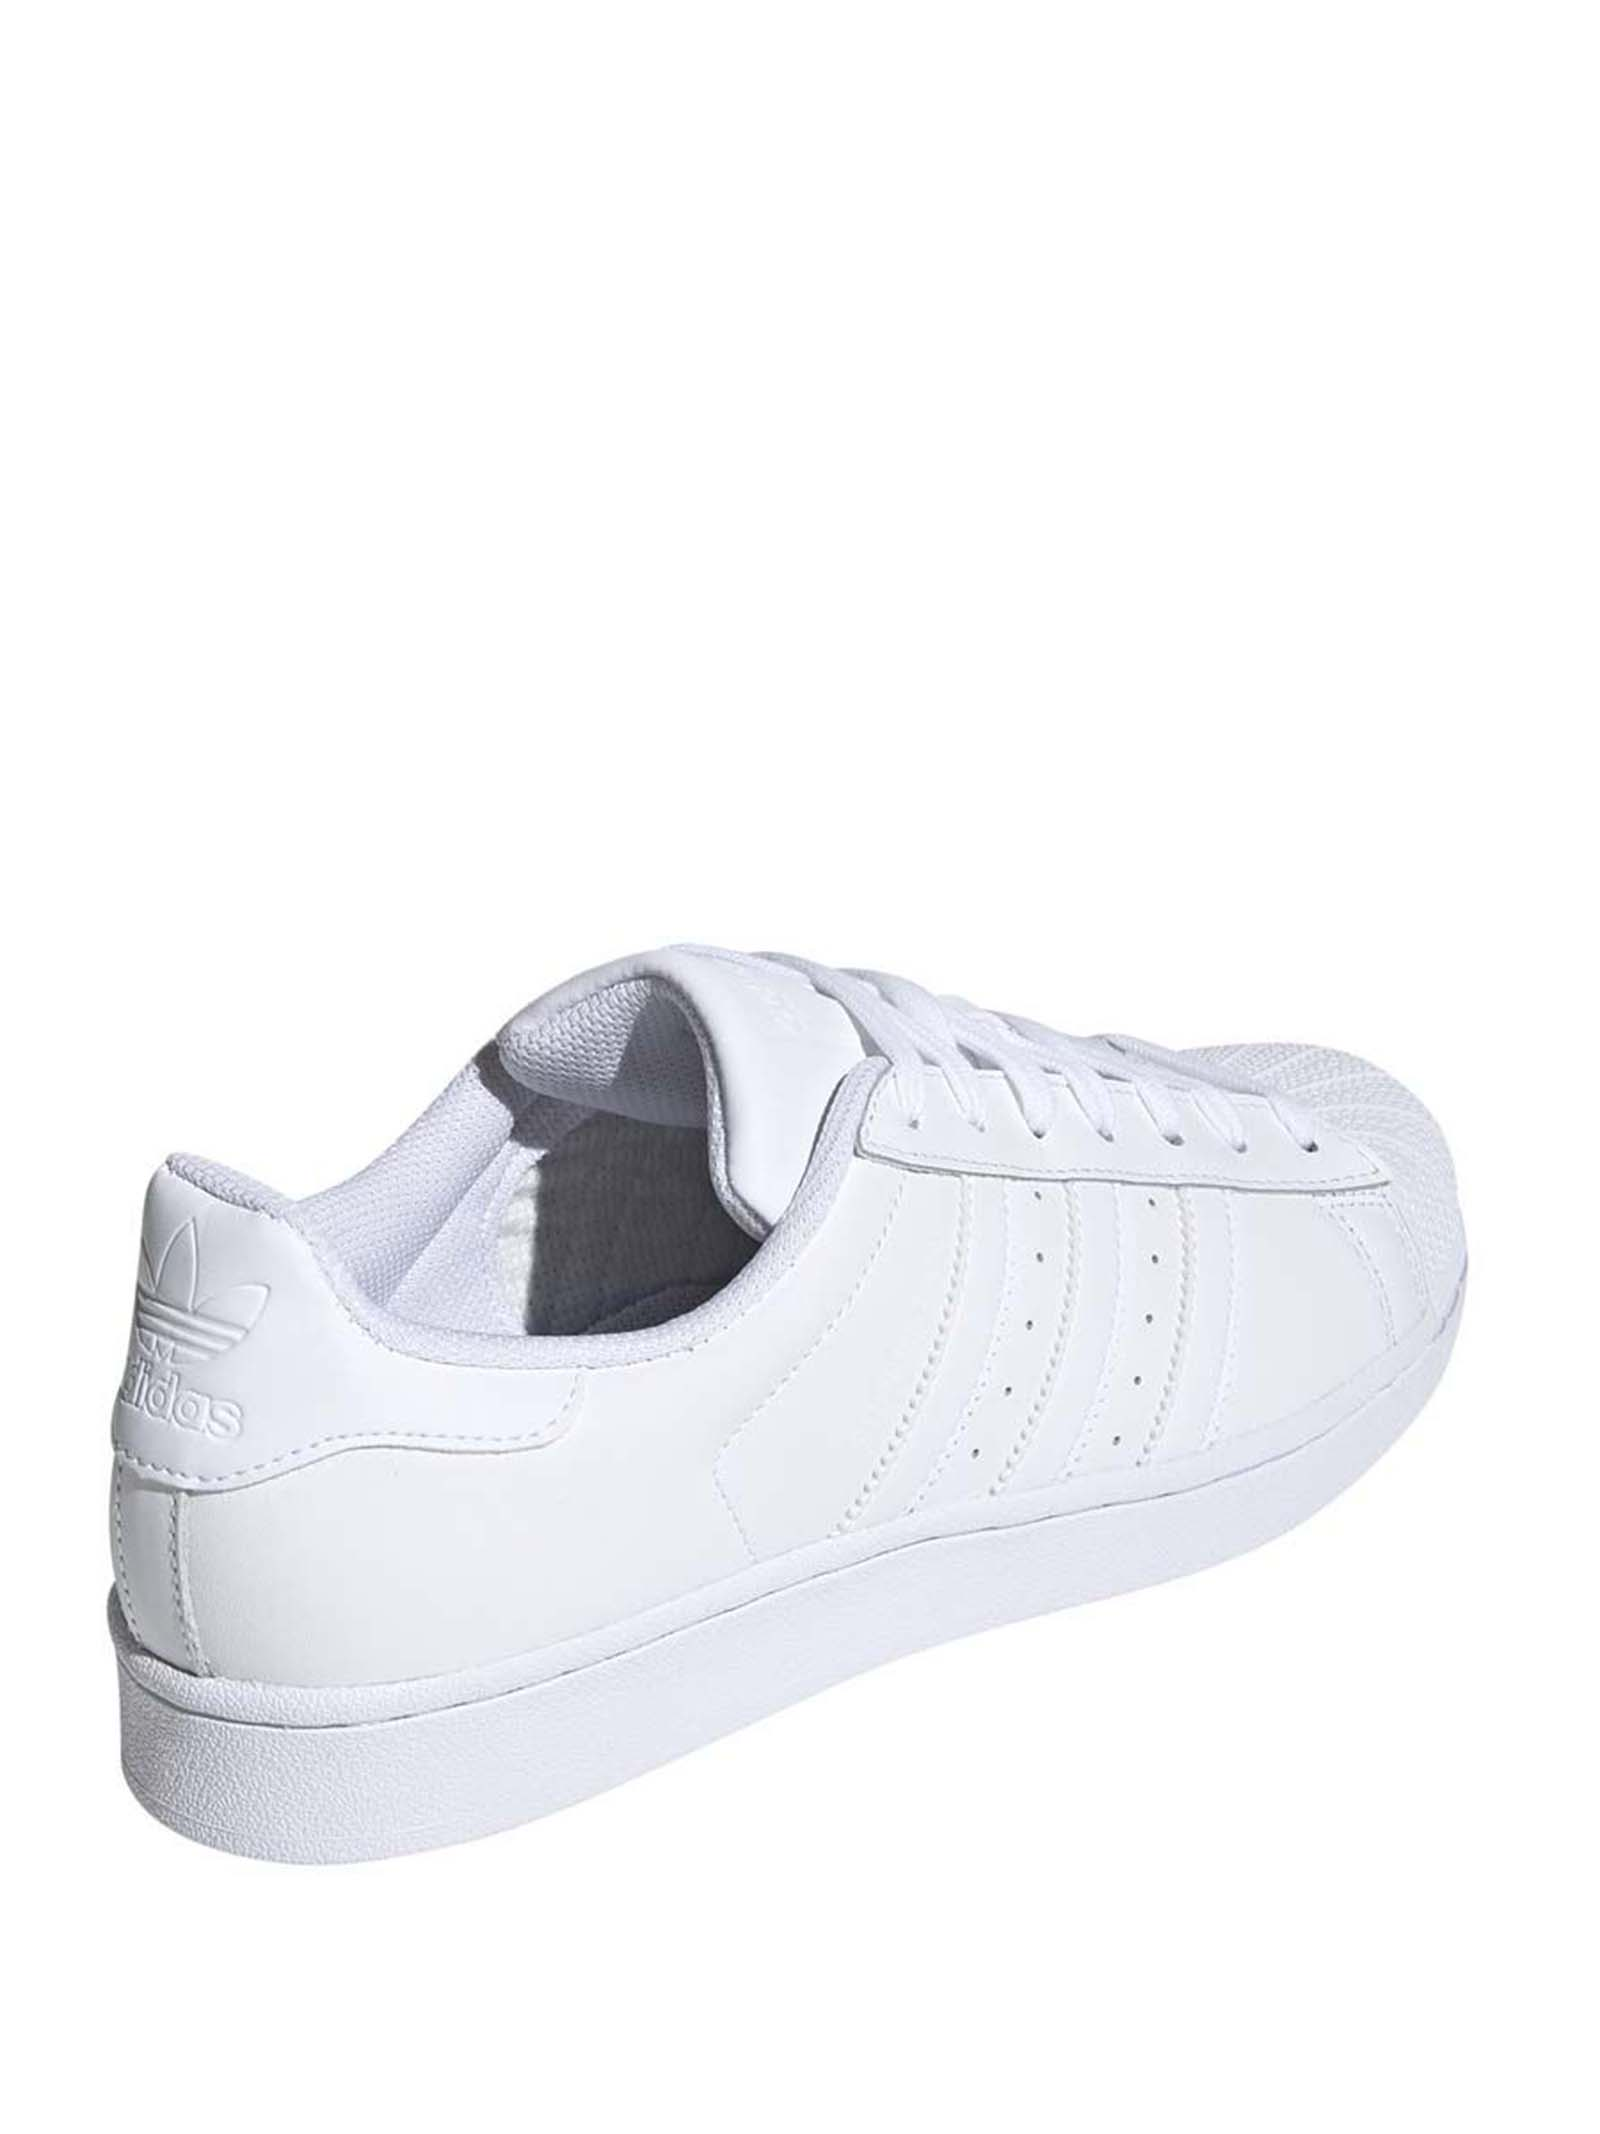 Men's Sneakers Superstar in White Leather EG4960 Adidas   Sneakers   SUPERSTAREG4960